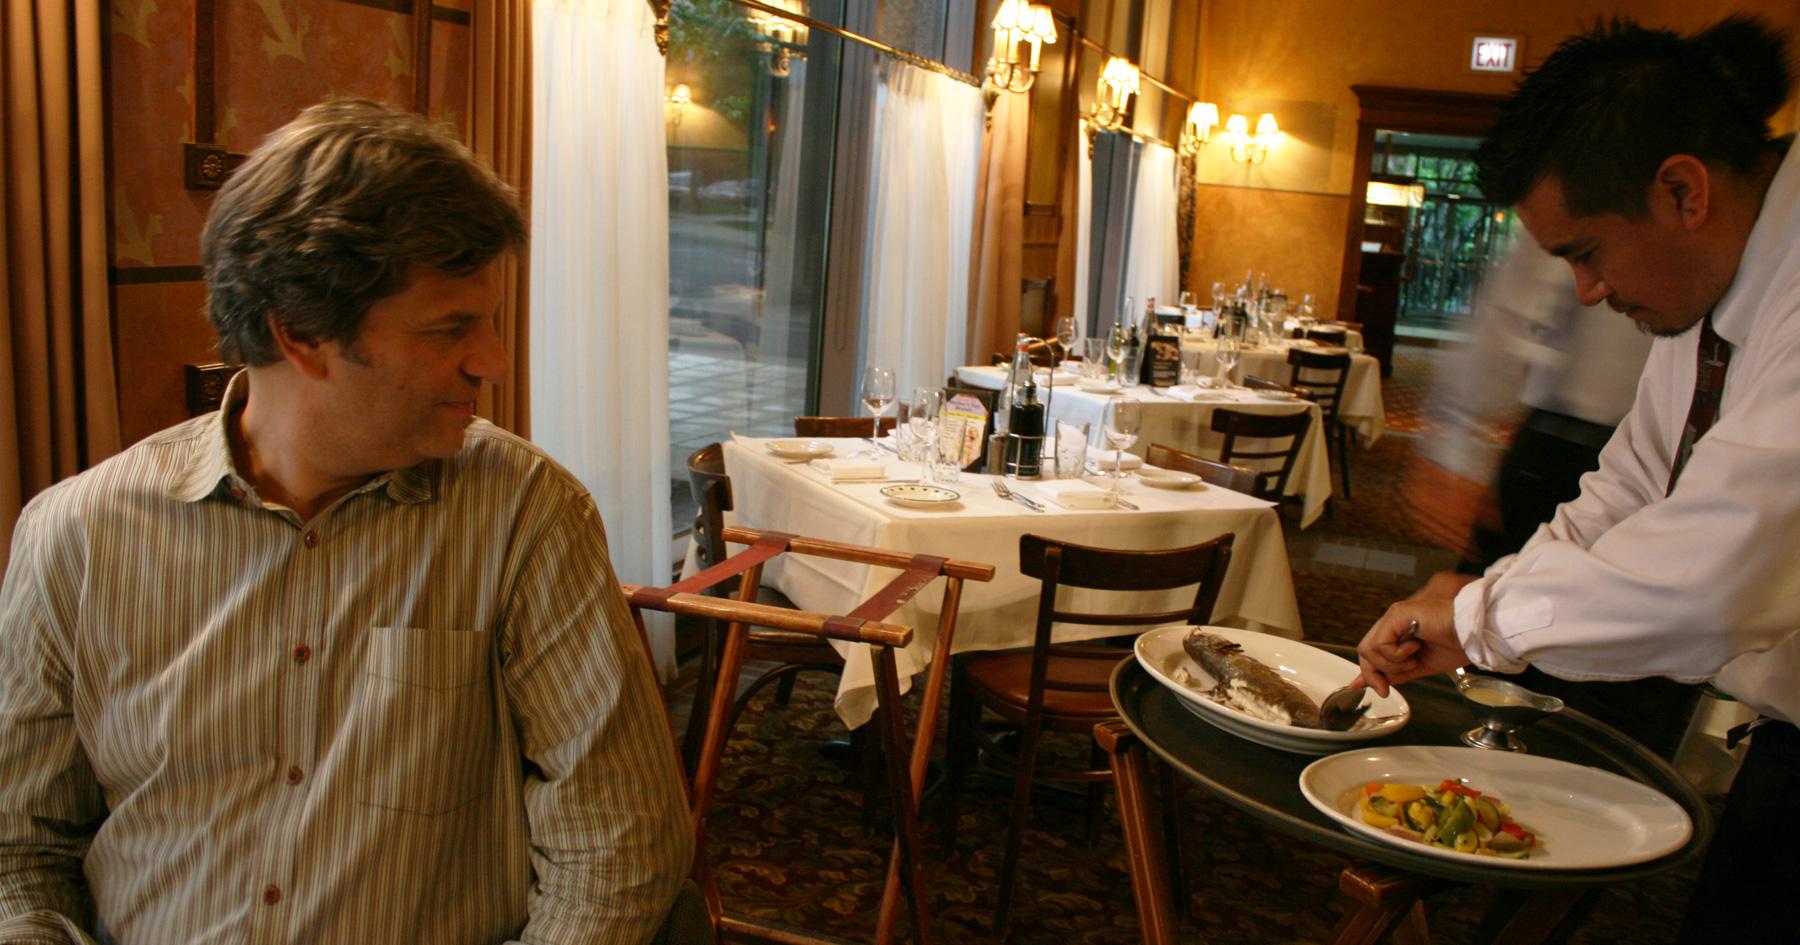 Man watching a restaurant worker serve food